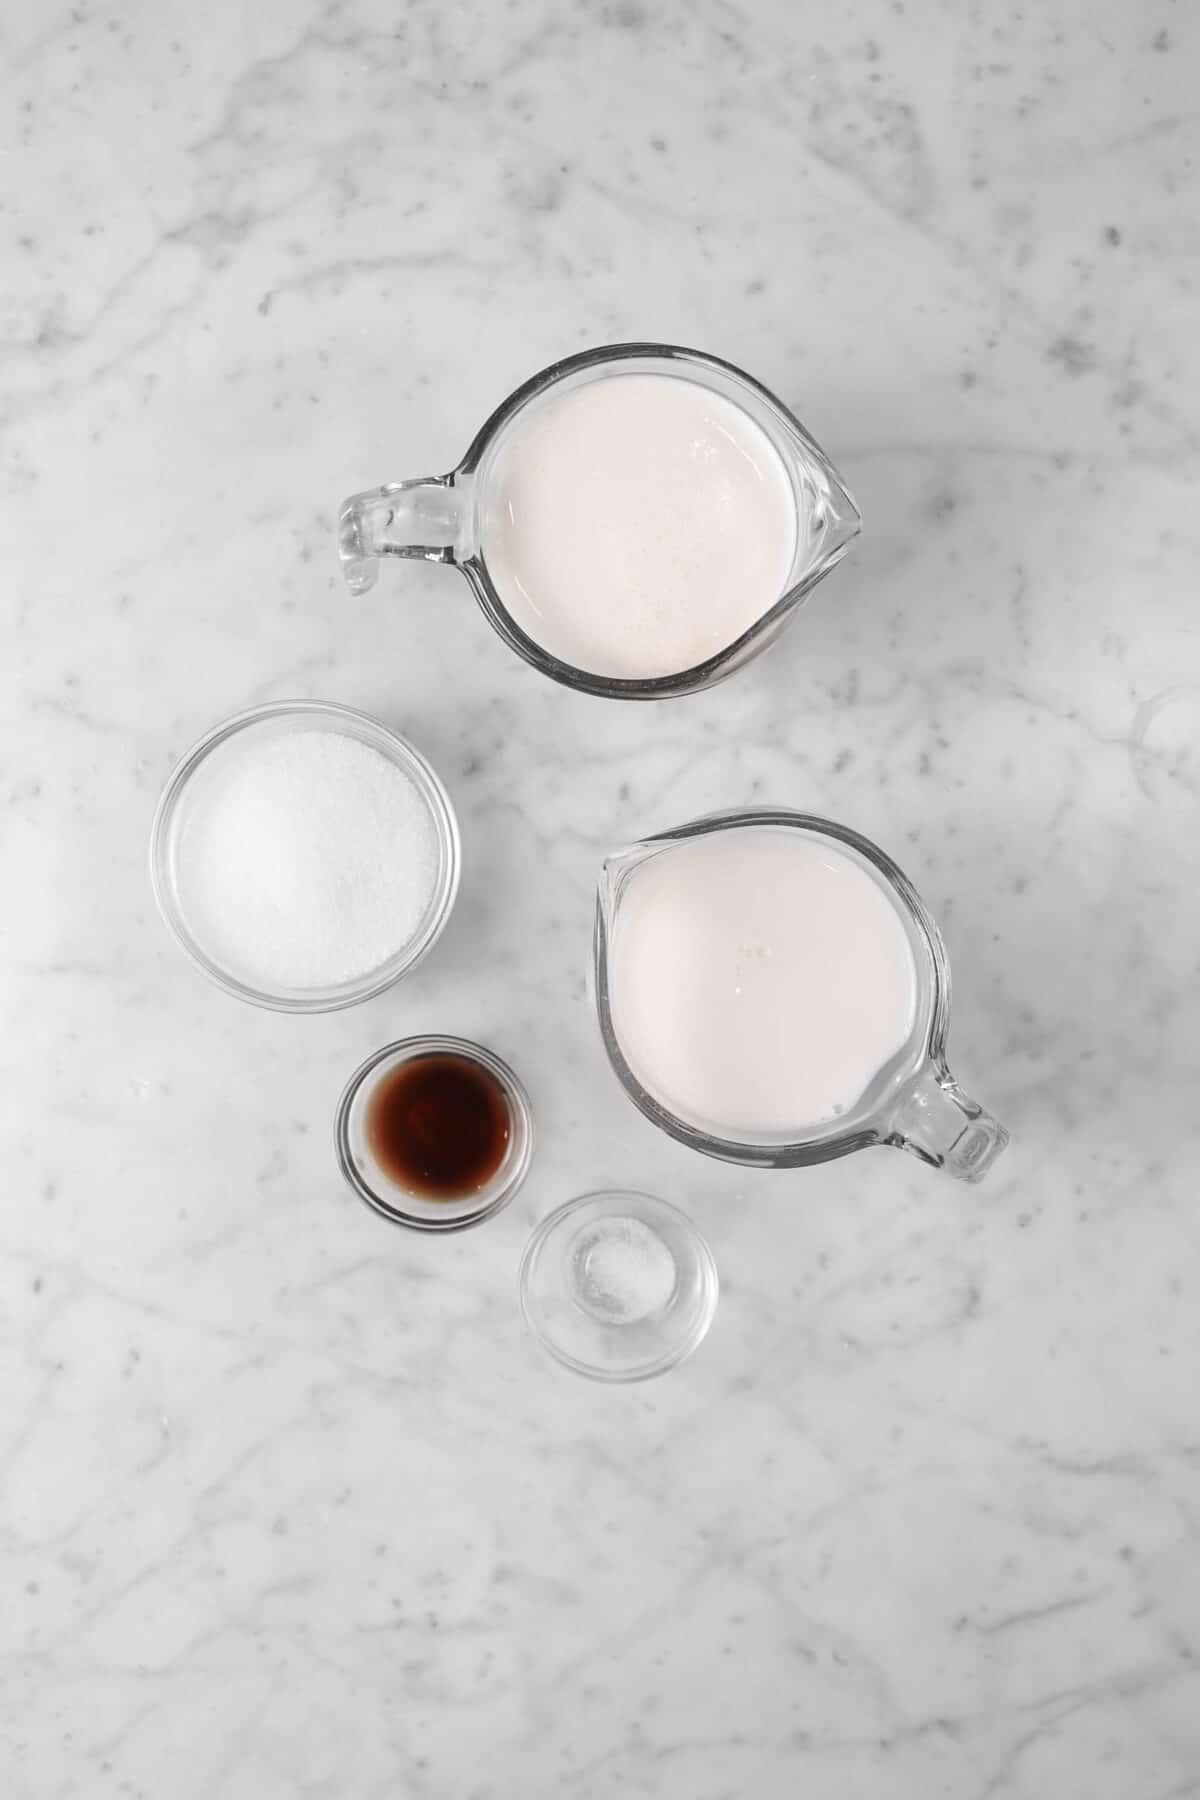 heavy cream, half and half, sugar, vanilla, and salt on marble counter